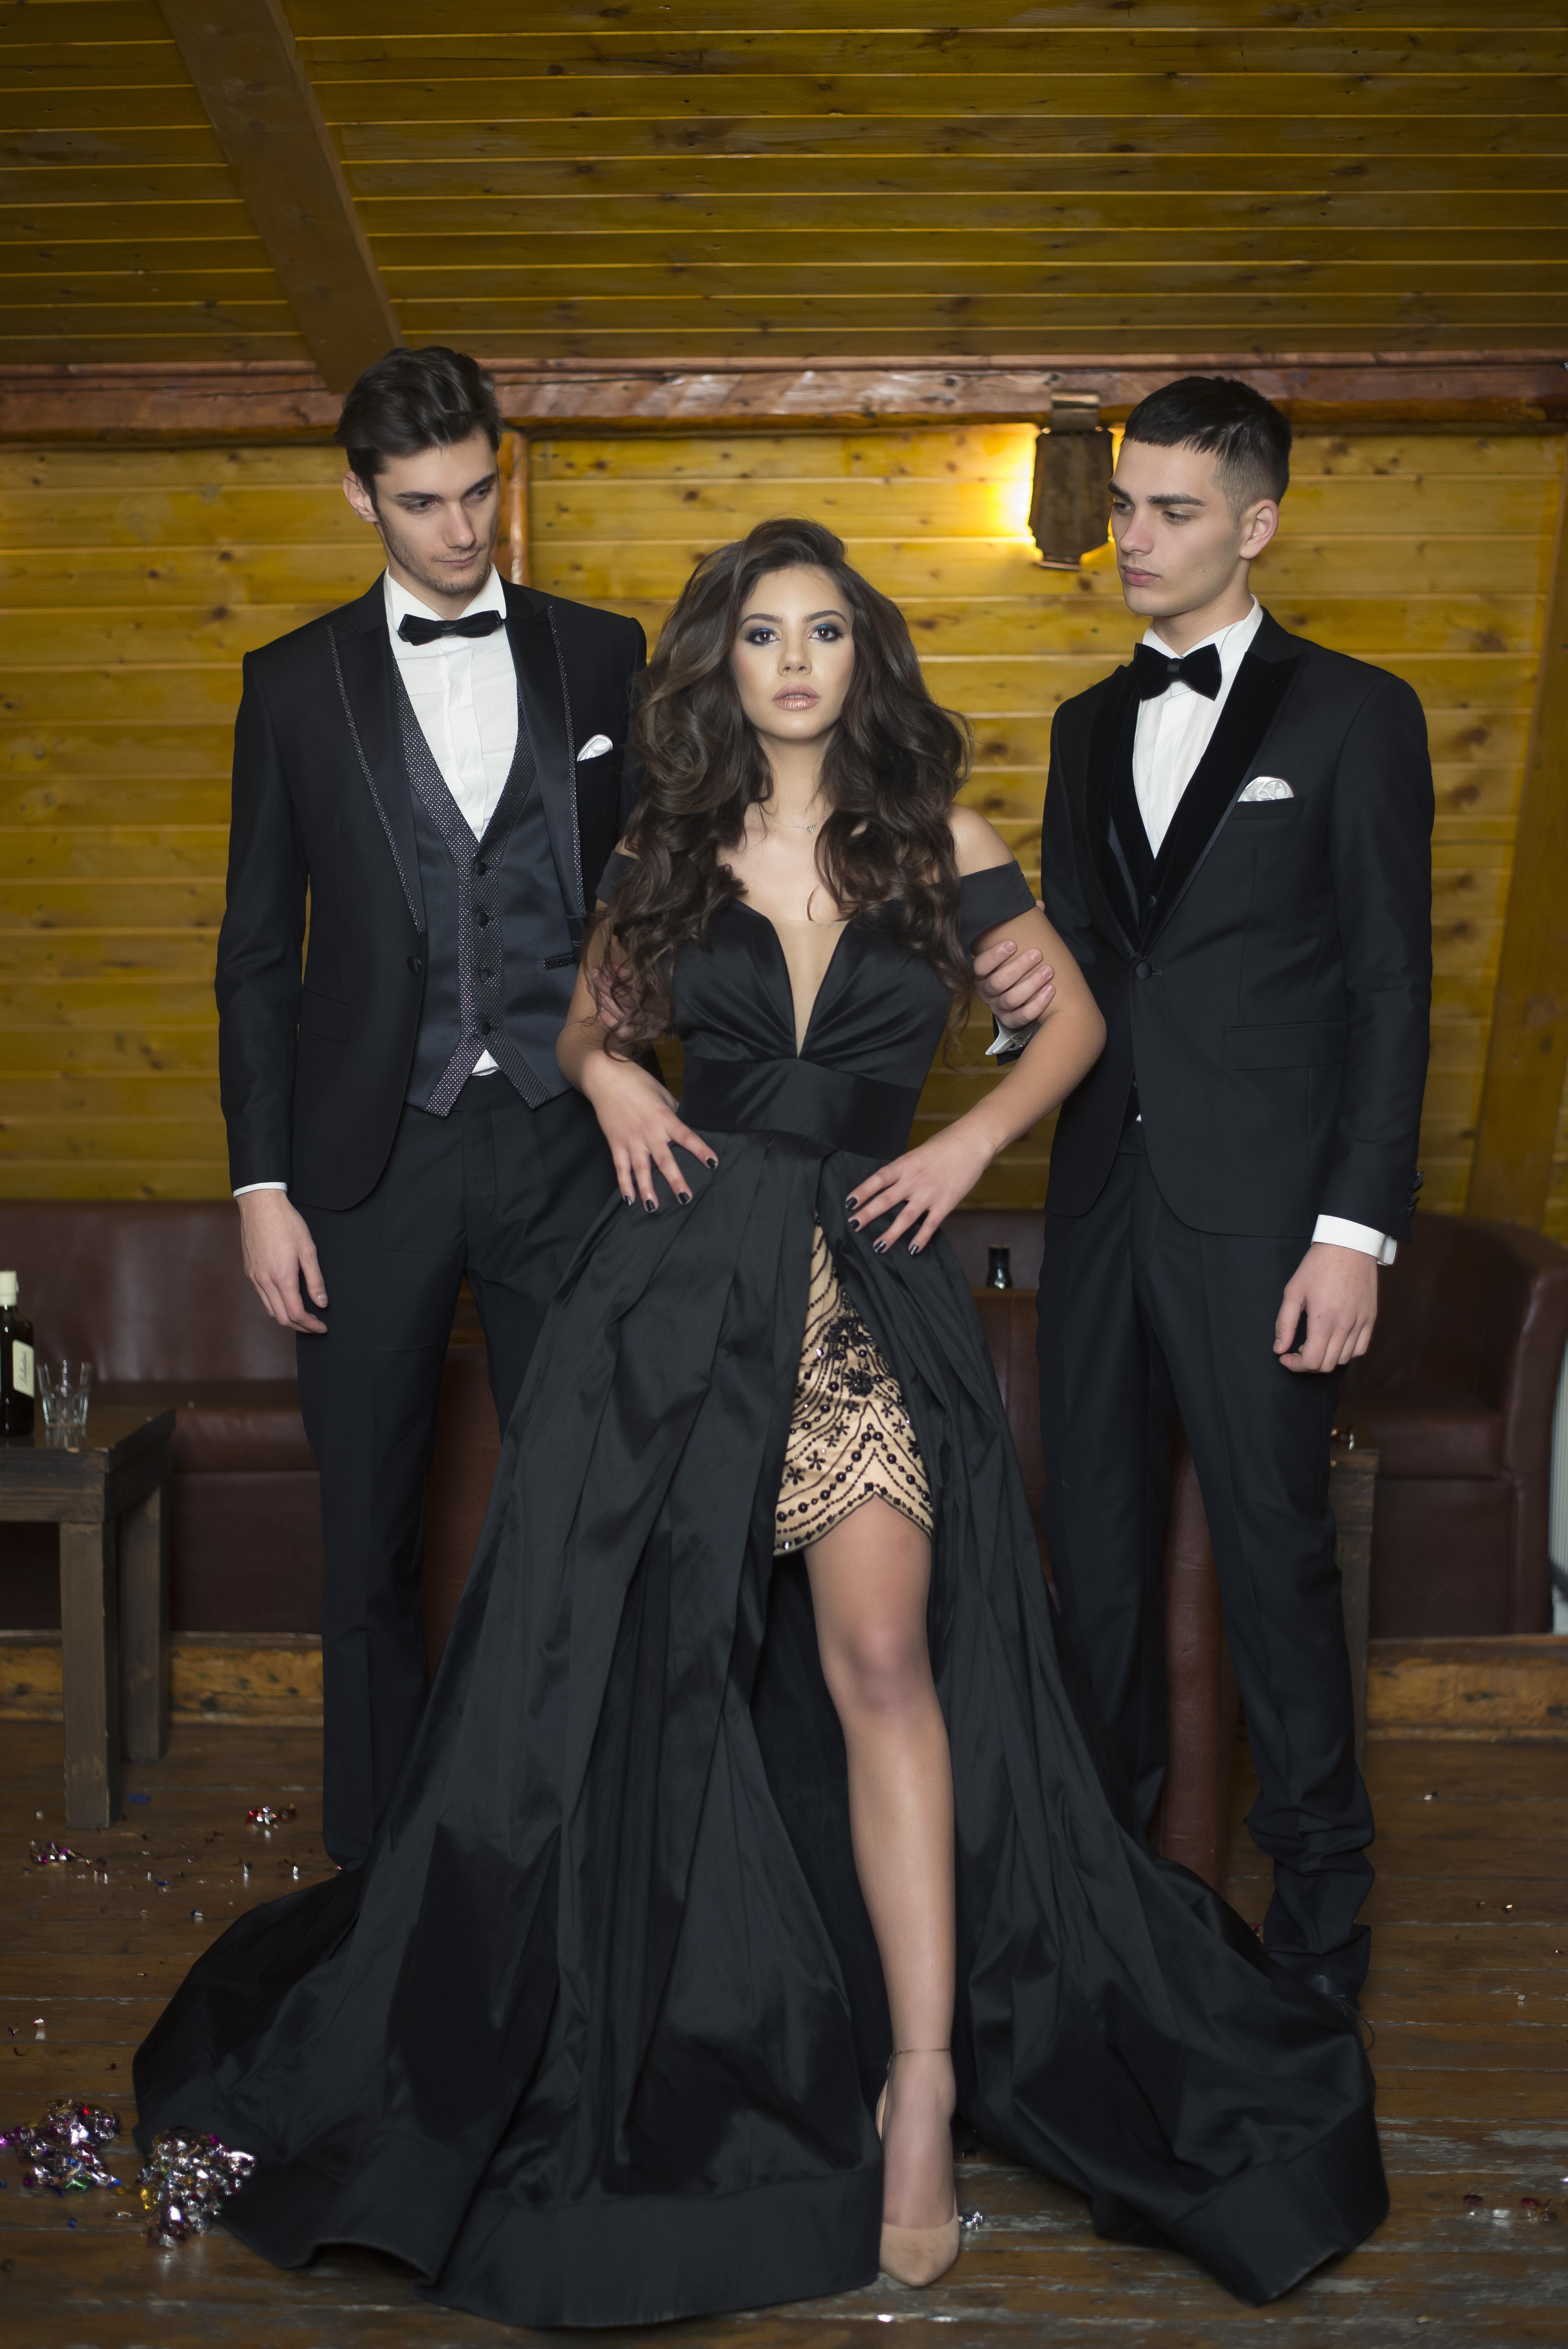 Woman Wearing Black Dress Standing in Between Two Men Wearing Black Suit